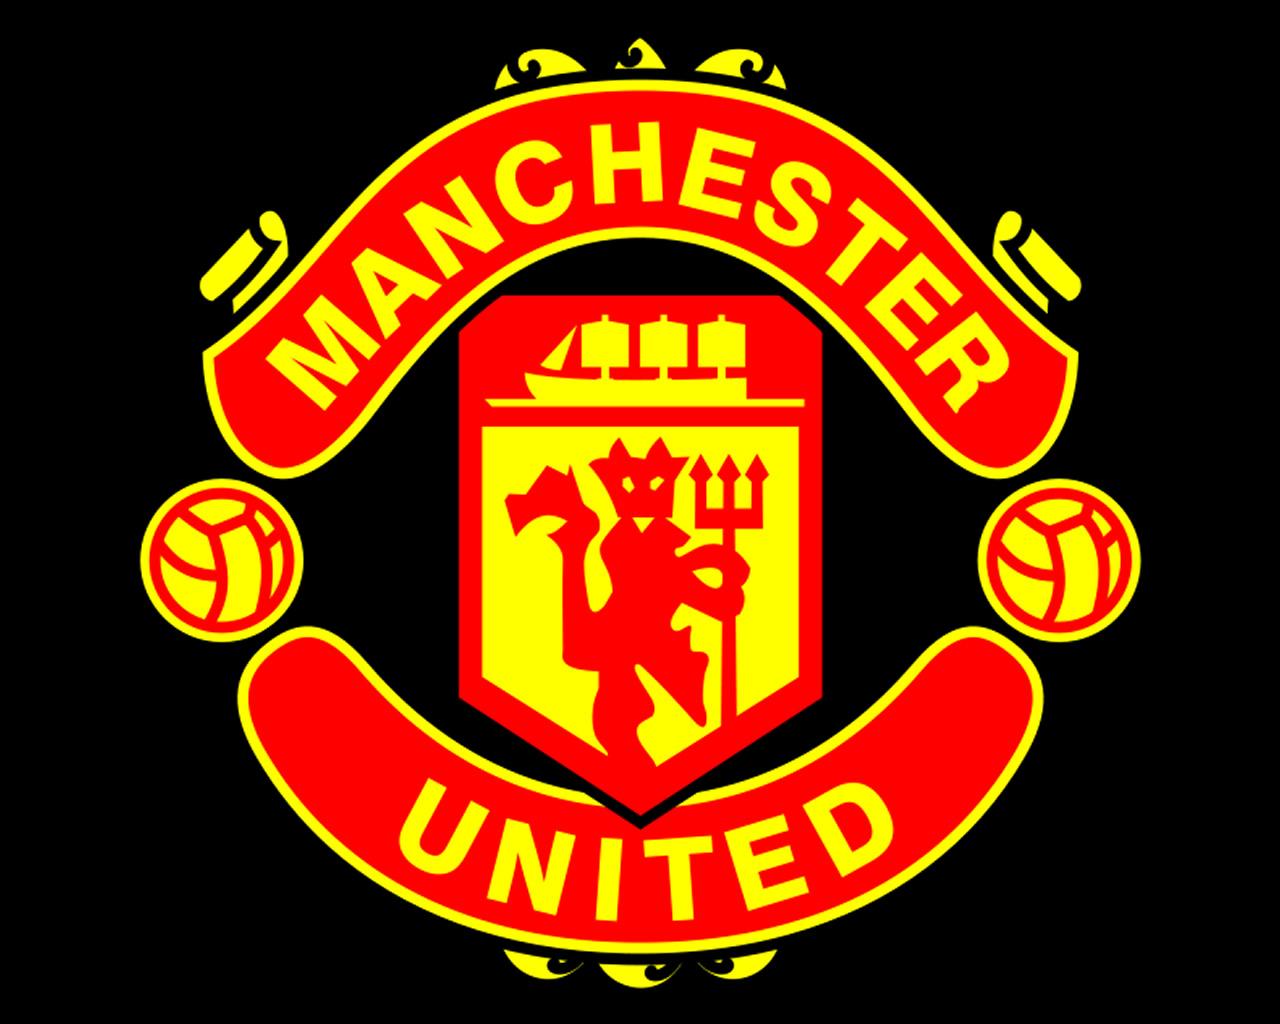 http://1.bp.blogspot.com/-W3wUB6yRvo4/UAZh_gru-kI/AAAAAAAACOI/b2Sp-BSAE4M/s1600/manchester_united_logo.jpg